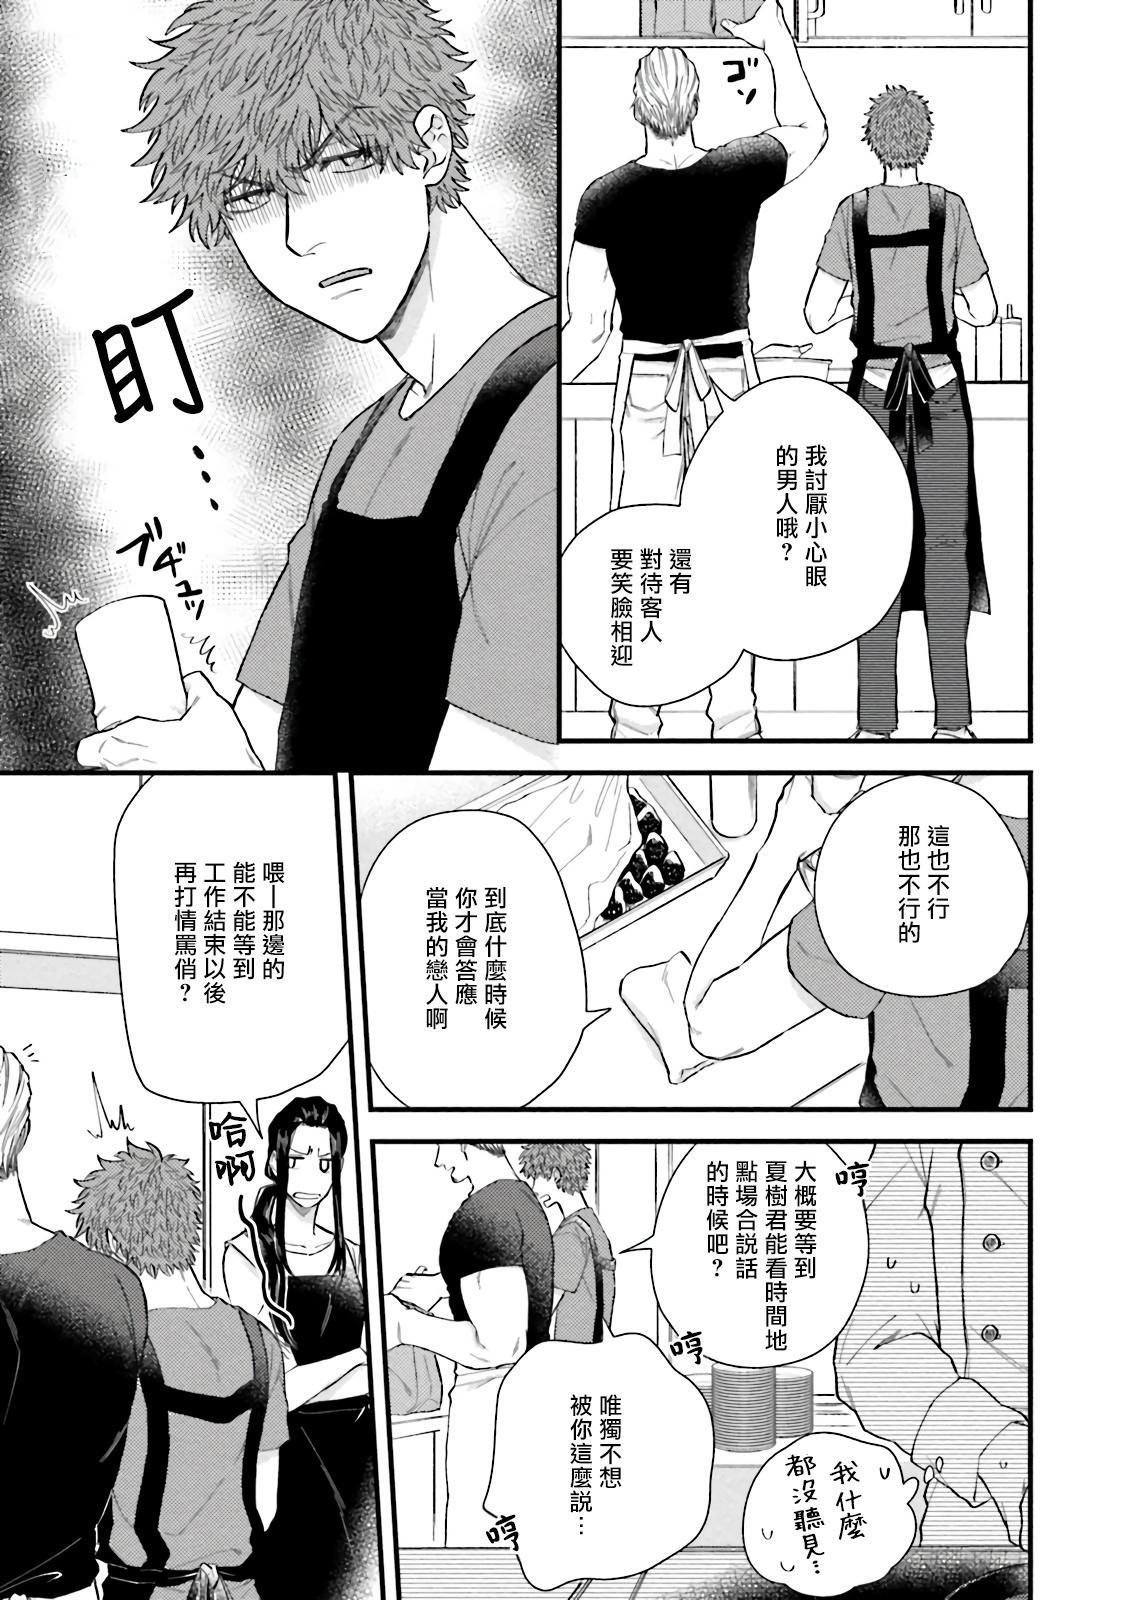 Kinou wa Otanoshimi Deshita ne | 昨天过得很愉快吧 Ch. 1-4+特典 51